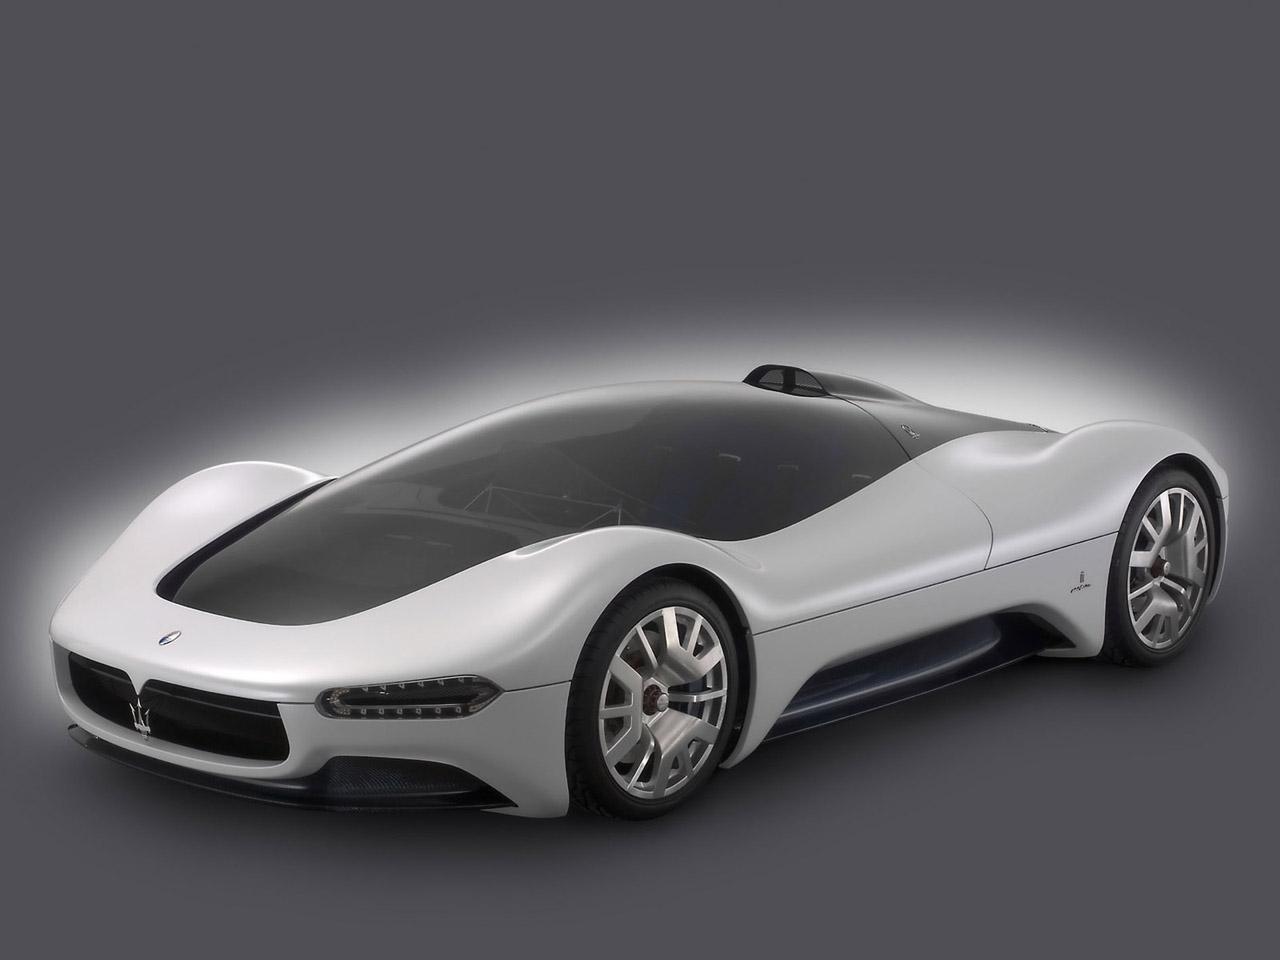 20 Creative Concept Cars Designm Ag